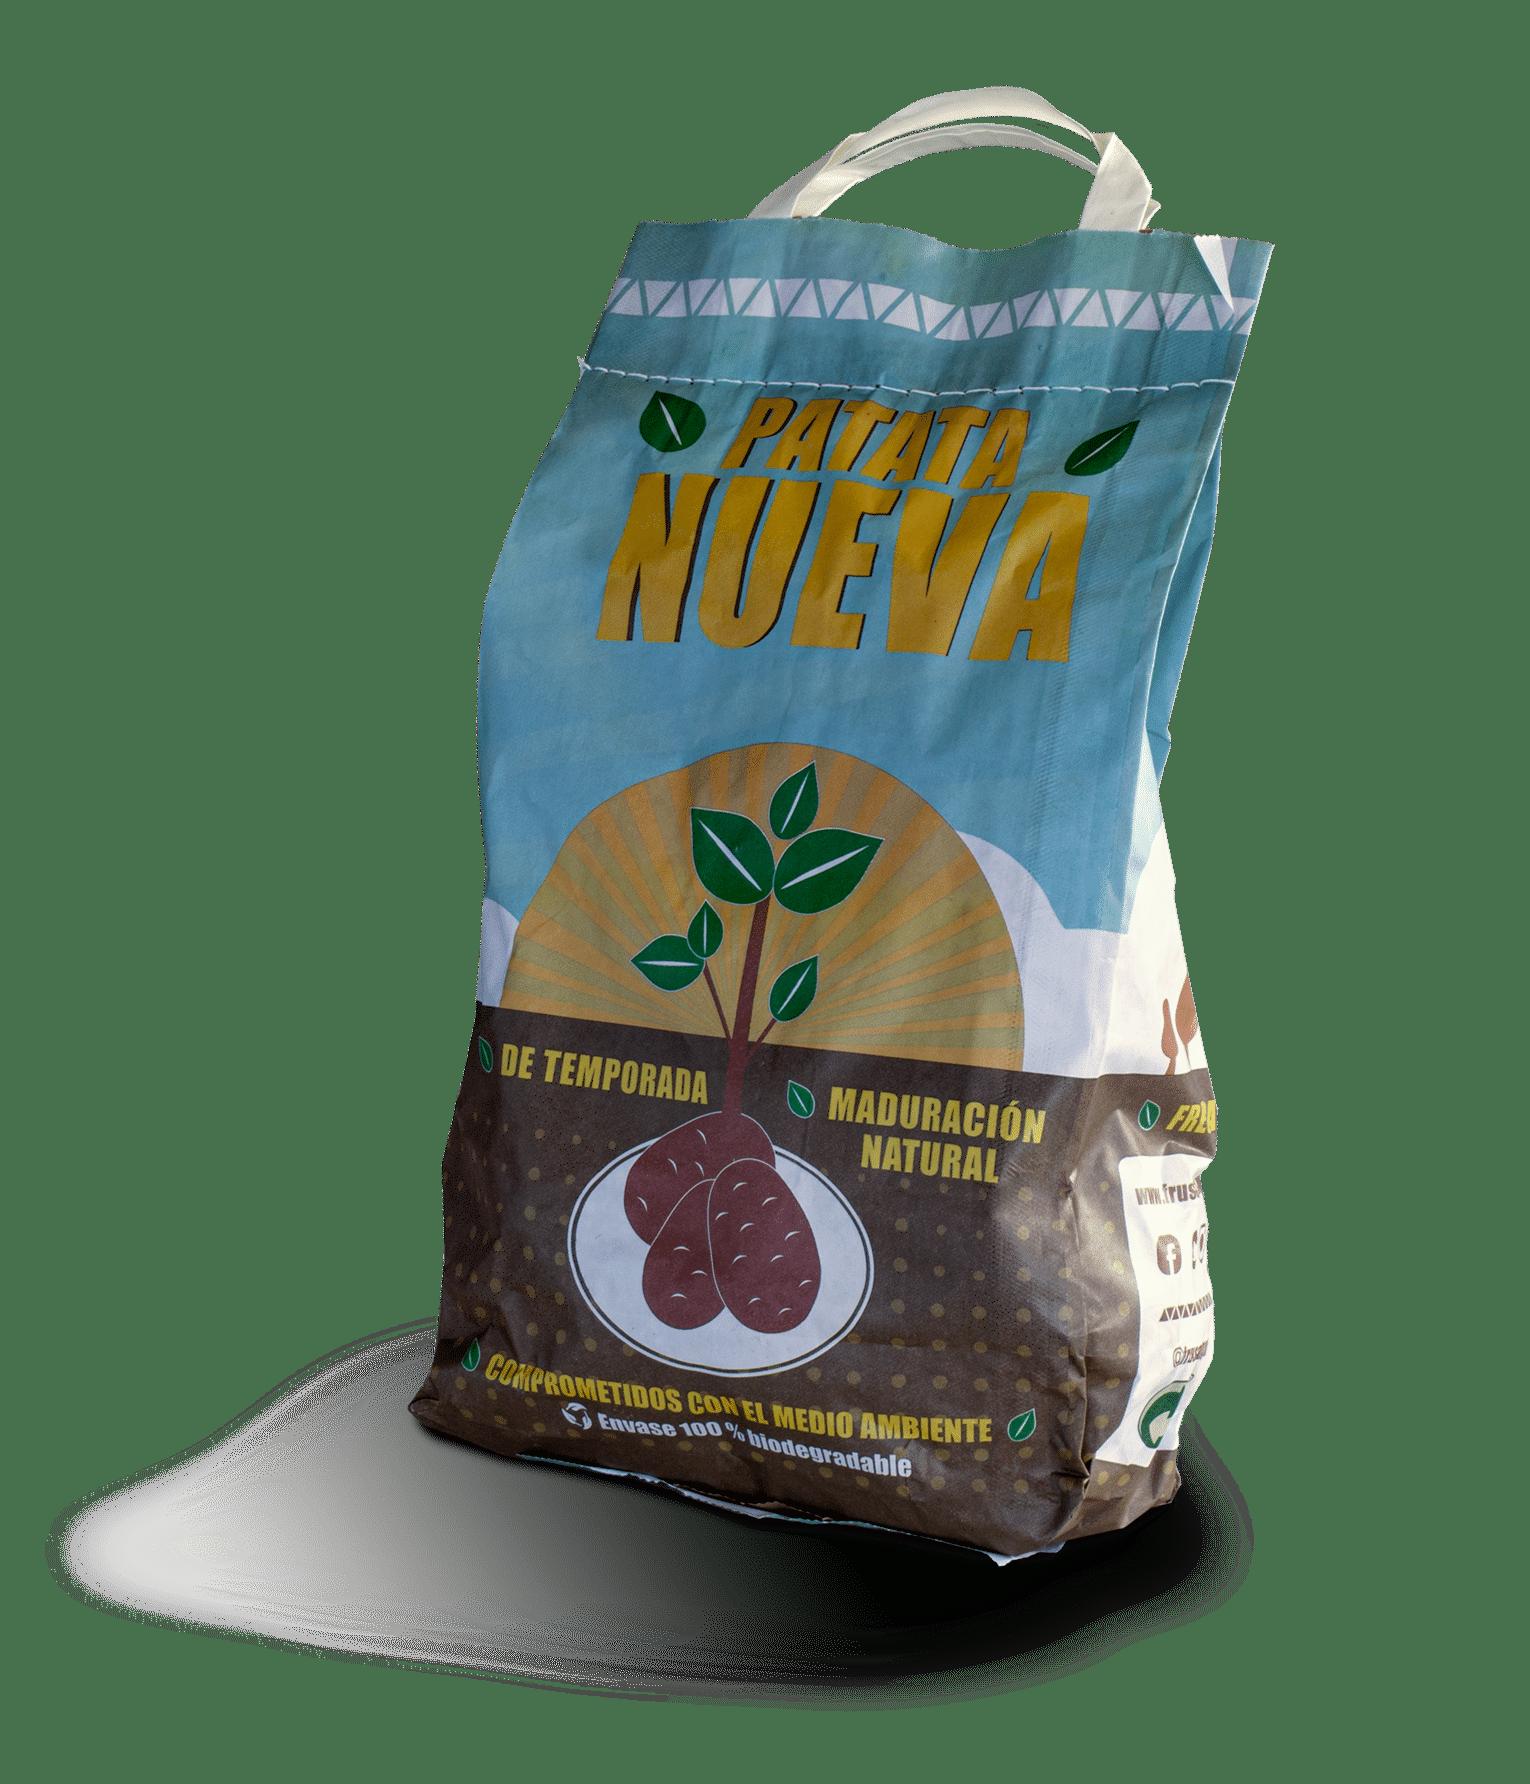 Bolsa patatas nuevas agrias Madrid